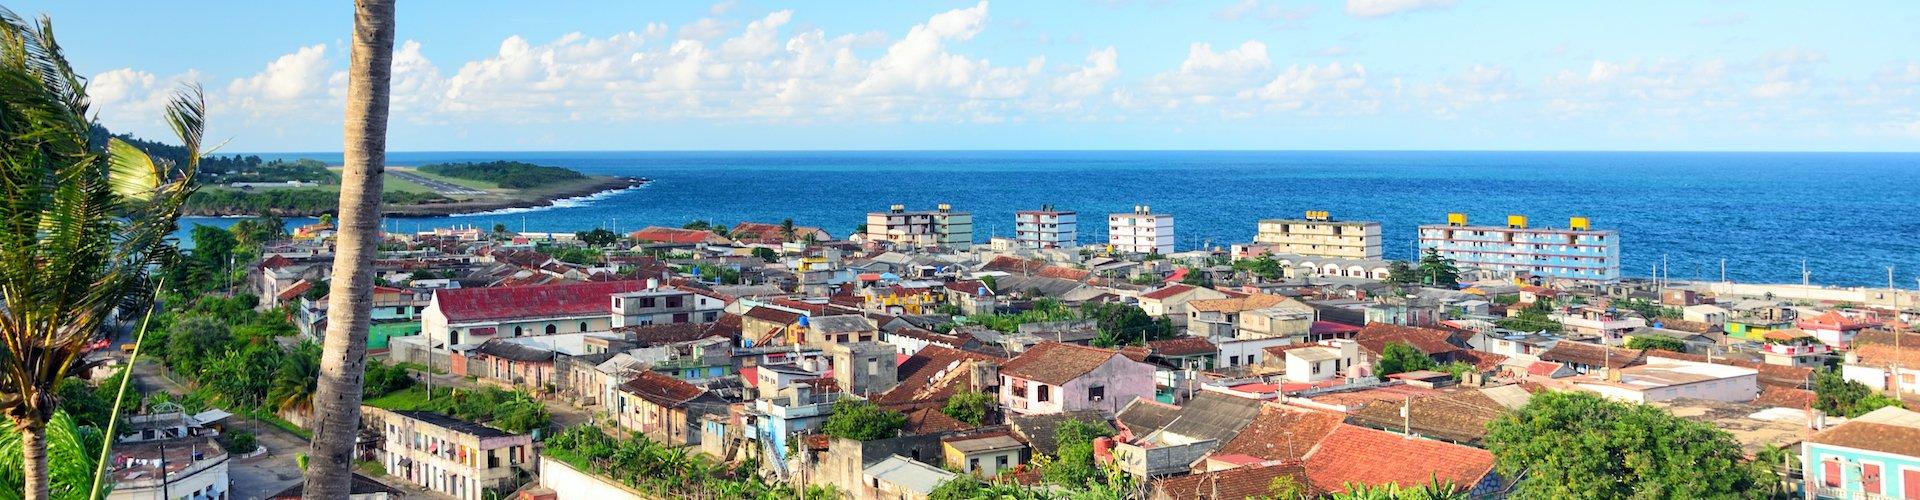 Ausflugsziel Baracoa